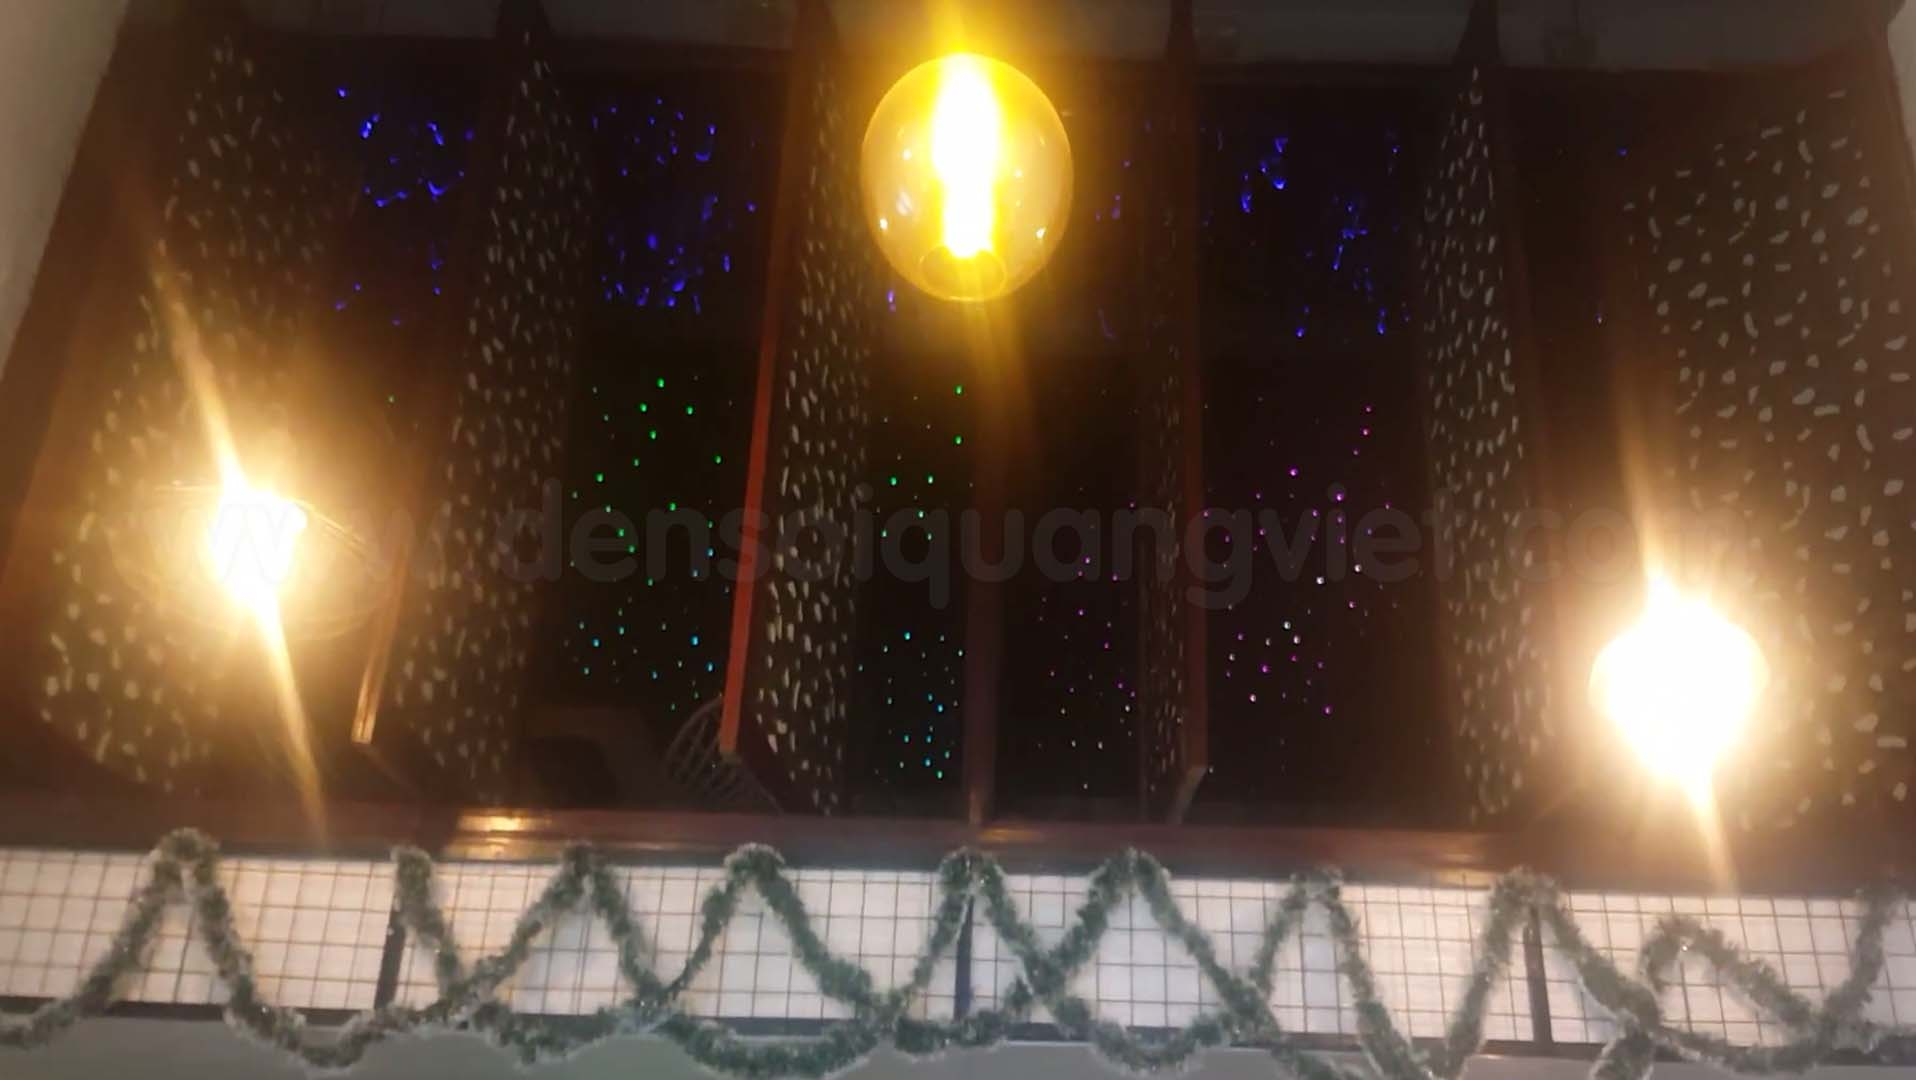 Tran sao nhan tao cafe shisha 4 - CAFE SHISHA HẢI PHÒNG